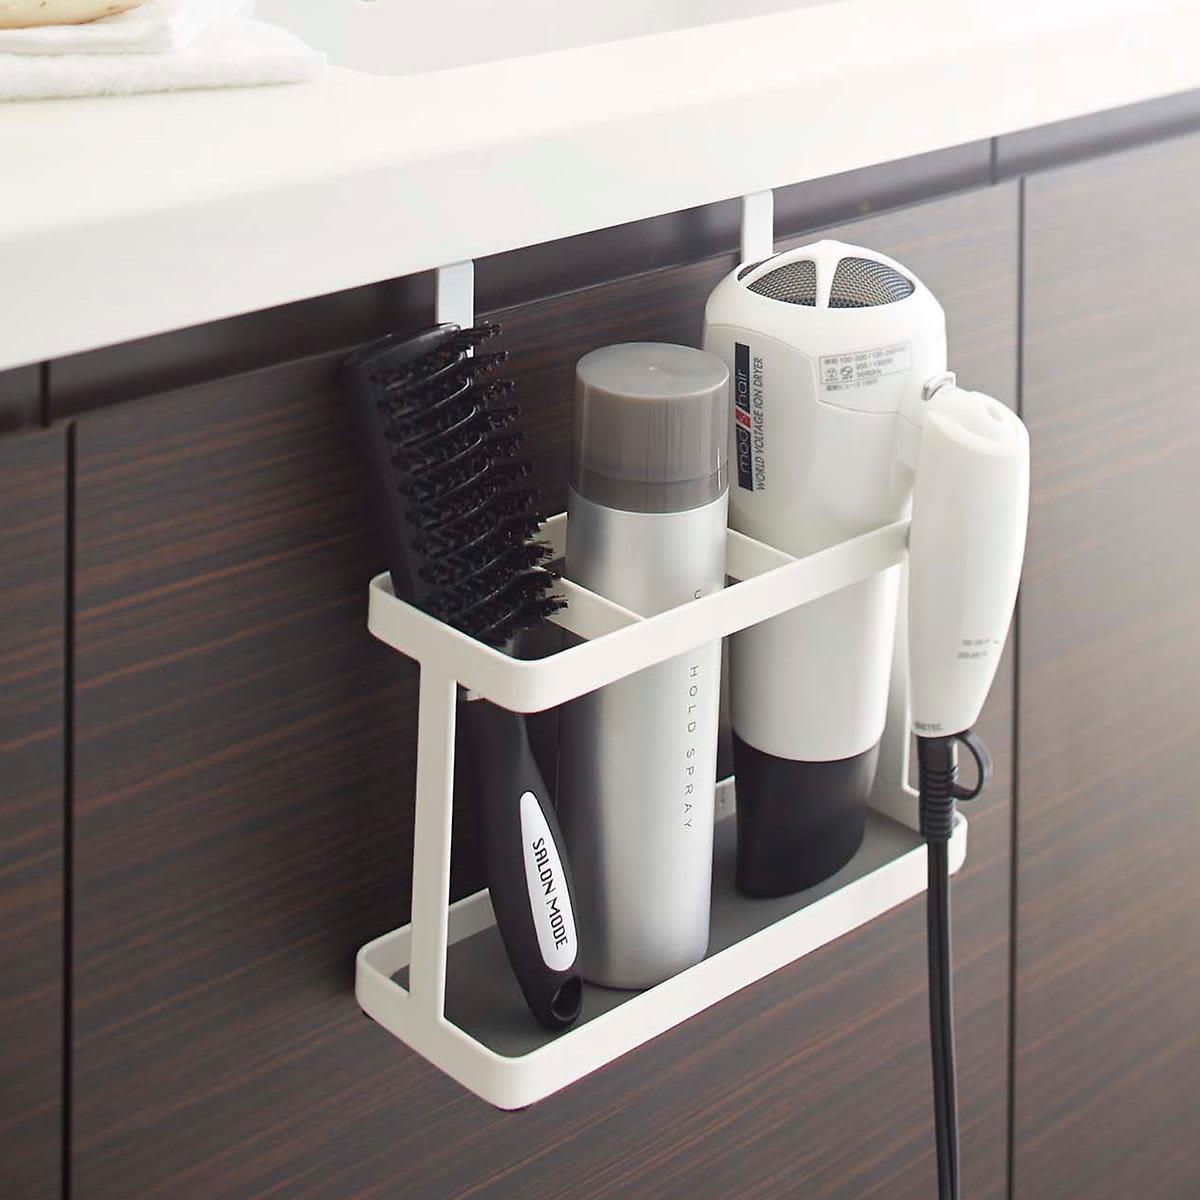 Bathroom Storage Ideas - Storage For Small Bathrooms ... on Small Apartment Bathroom Storage Ideas  id=77951